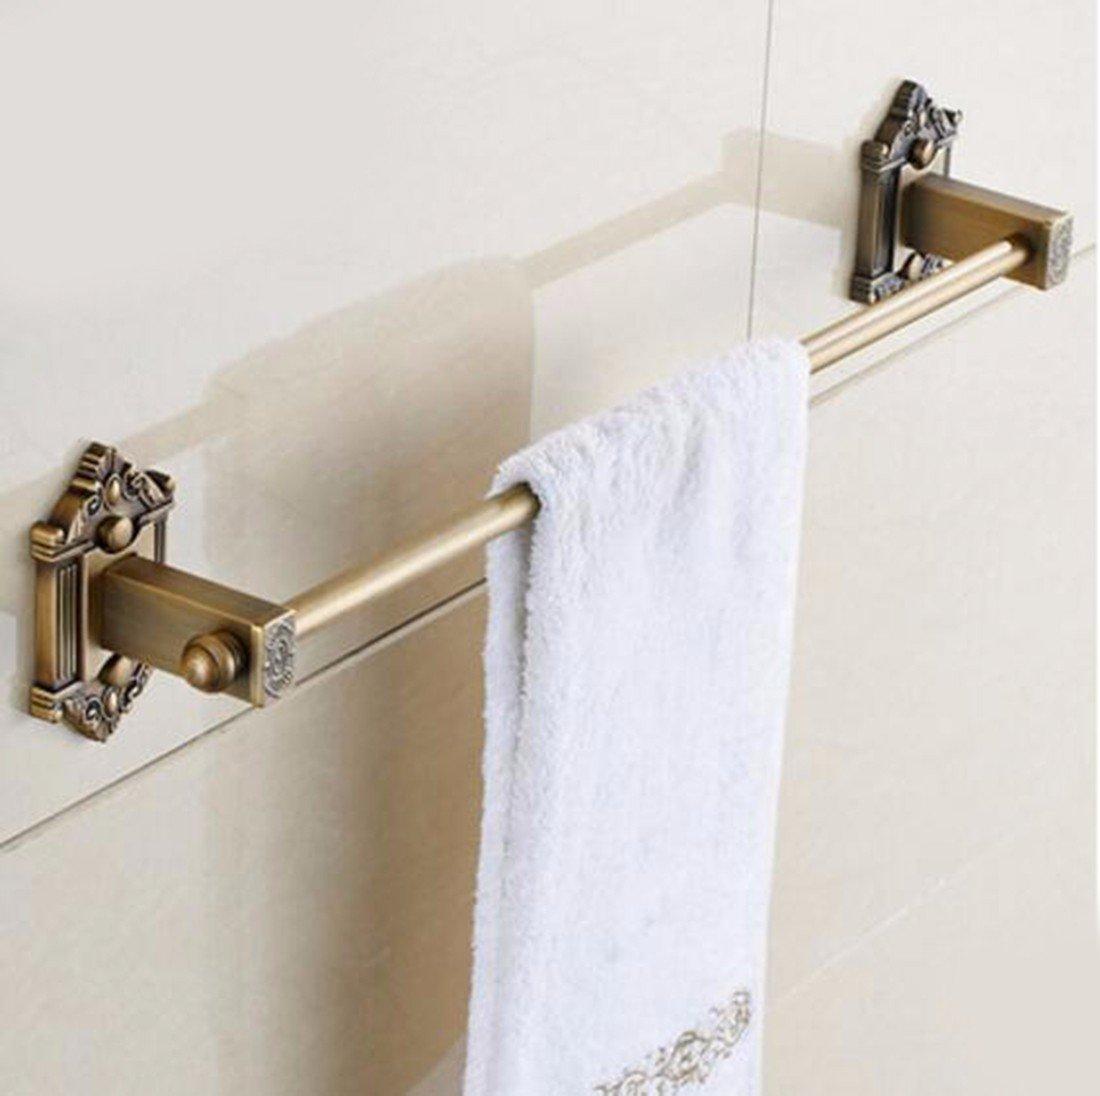 Sursy Jardín de estilo europeo puro cobre antiguo retro toalla toallero barra Barra de toalla de baño Guadan,accesorios de hardware: Amazon.es: Hogar